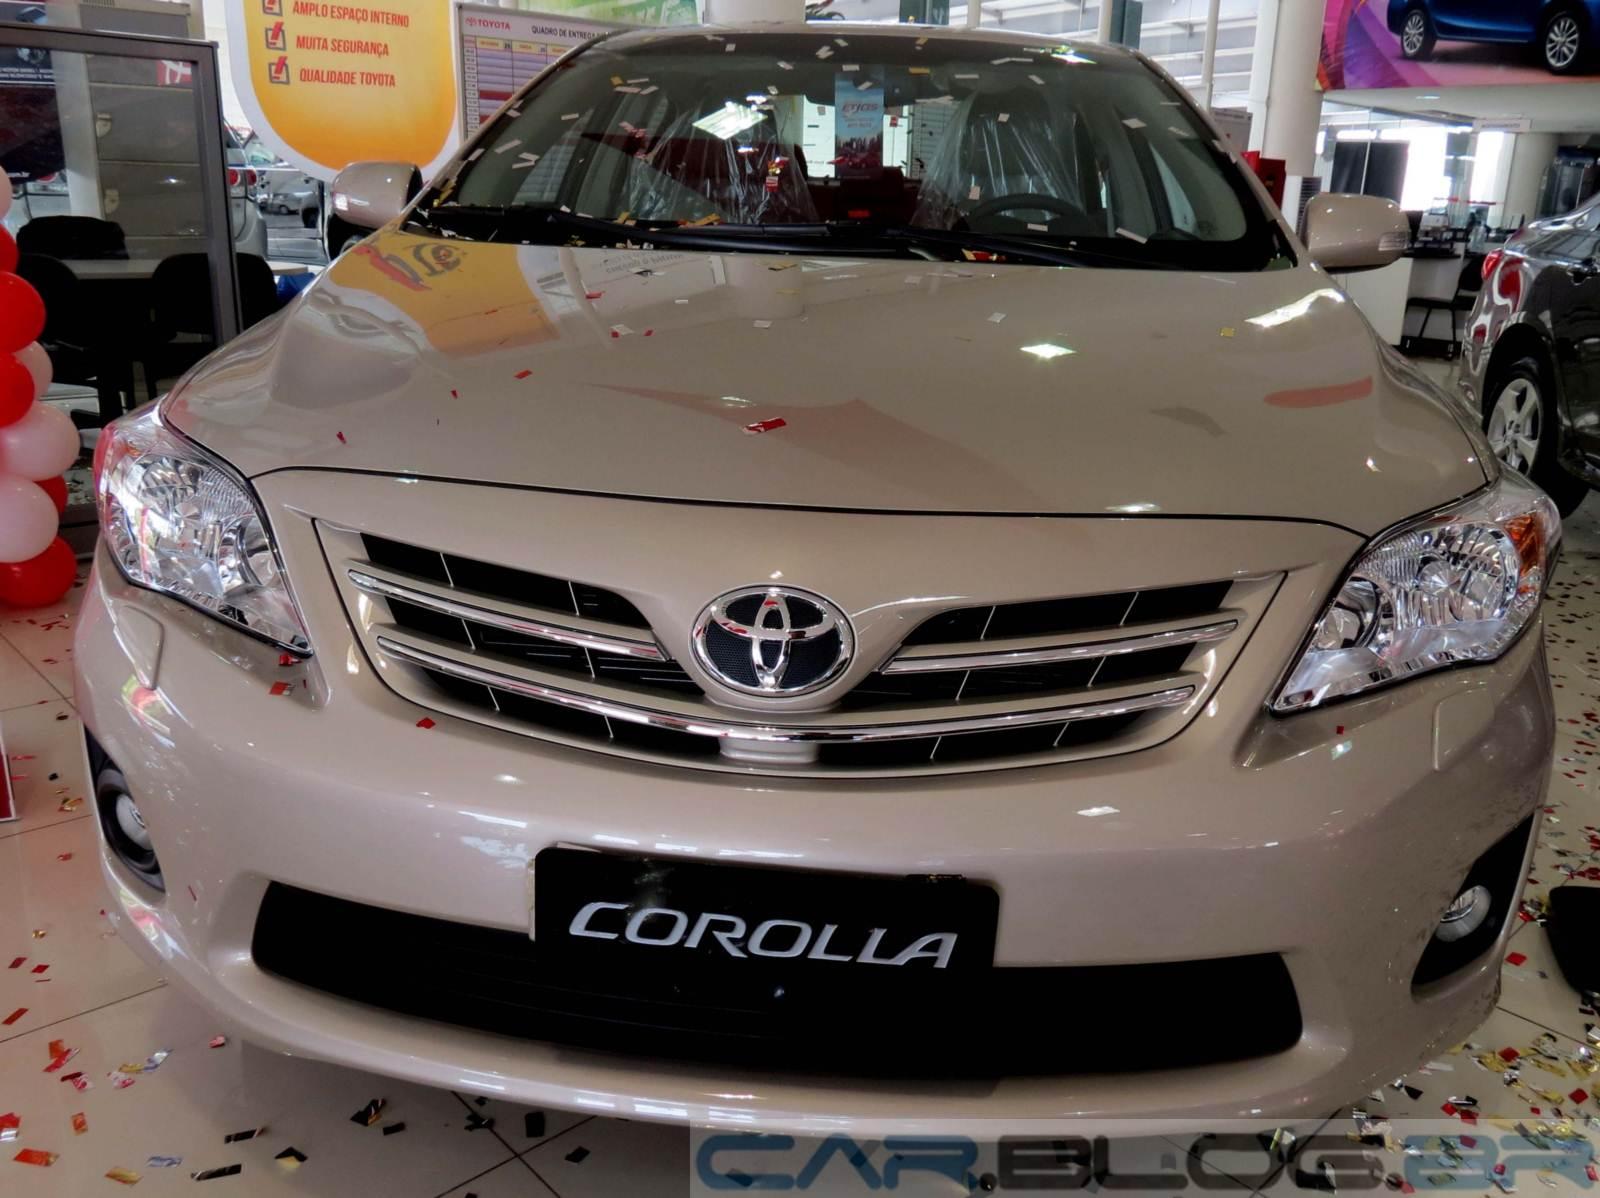 http://2.bp.blogspot.com/-FFxI-OlC-6Y/UU4gNgs4wNI/AAAAAAAA8f4/WRB_TEcj9TA/s1600/Toyota-Corolla-2014-altis%20(1).JPG